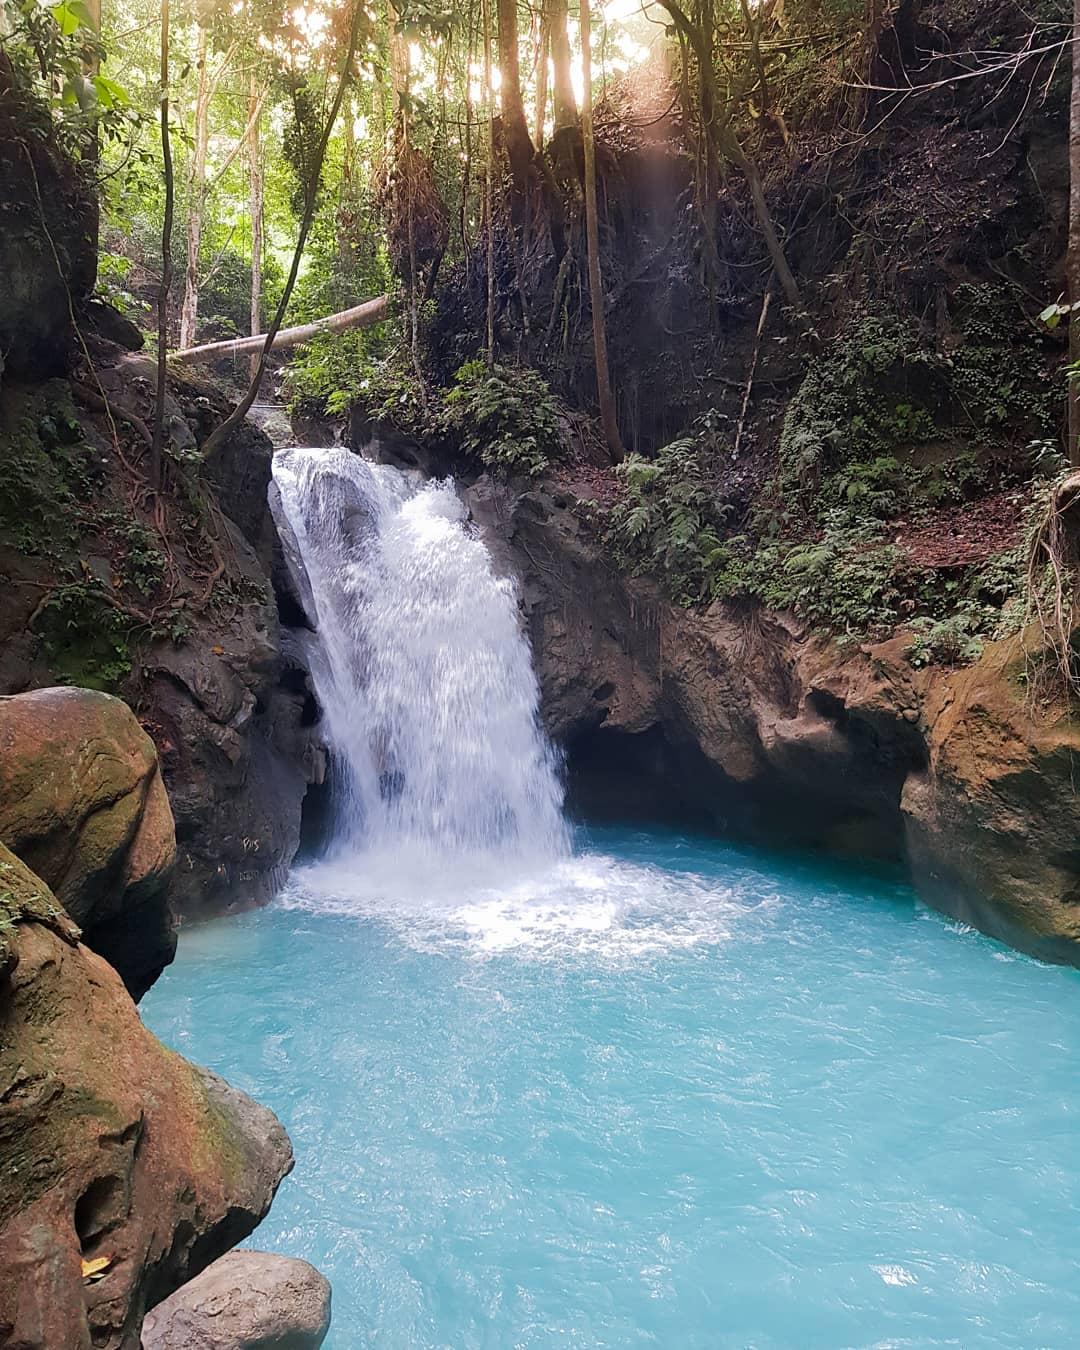 8 Destinasi Wisata Cantik di Banggai, Rugi Kalau Gak ke Sana